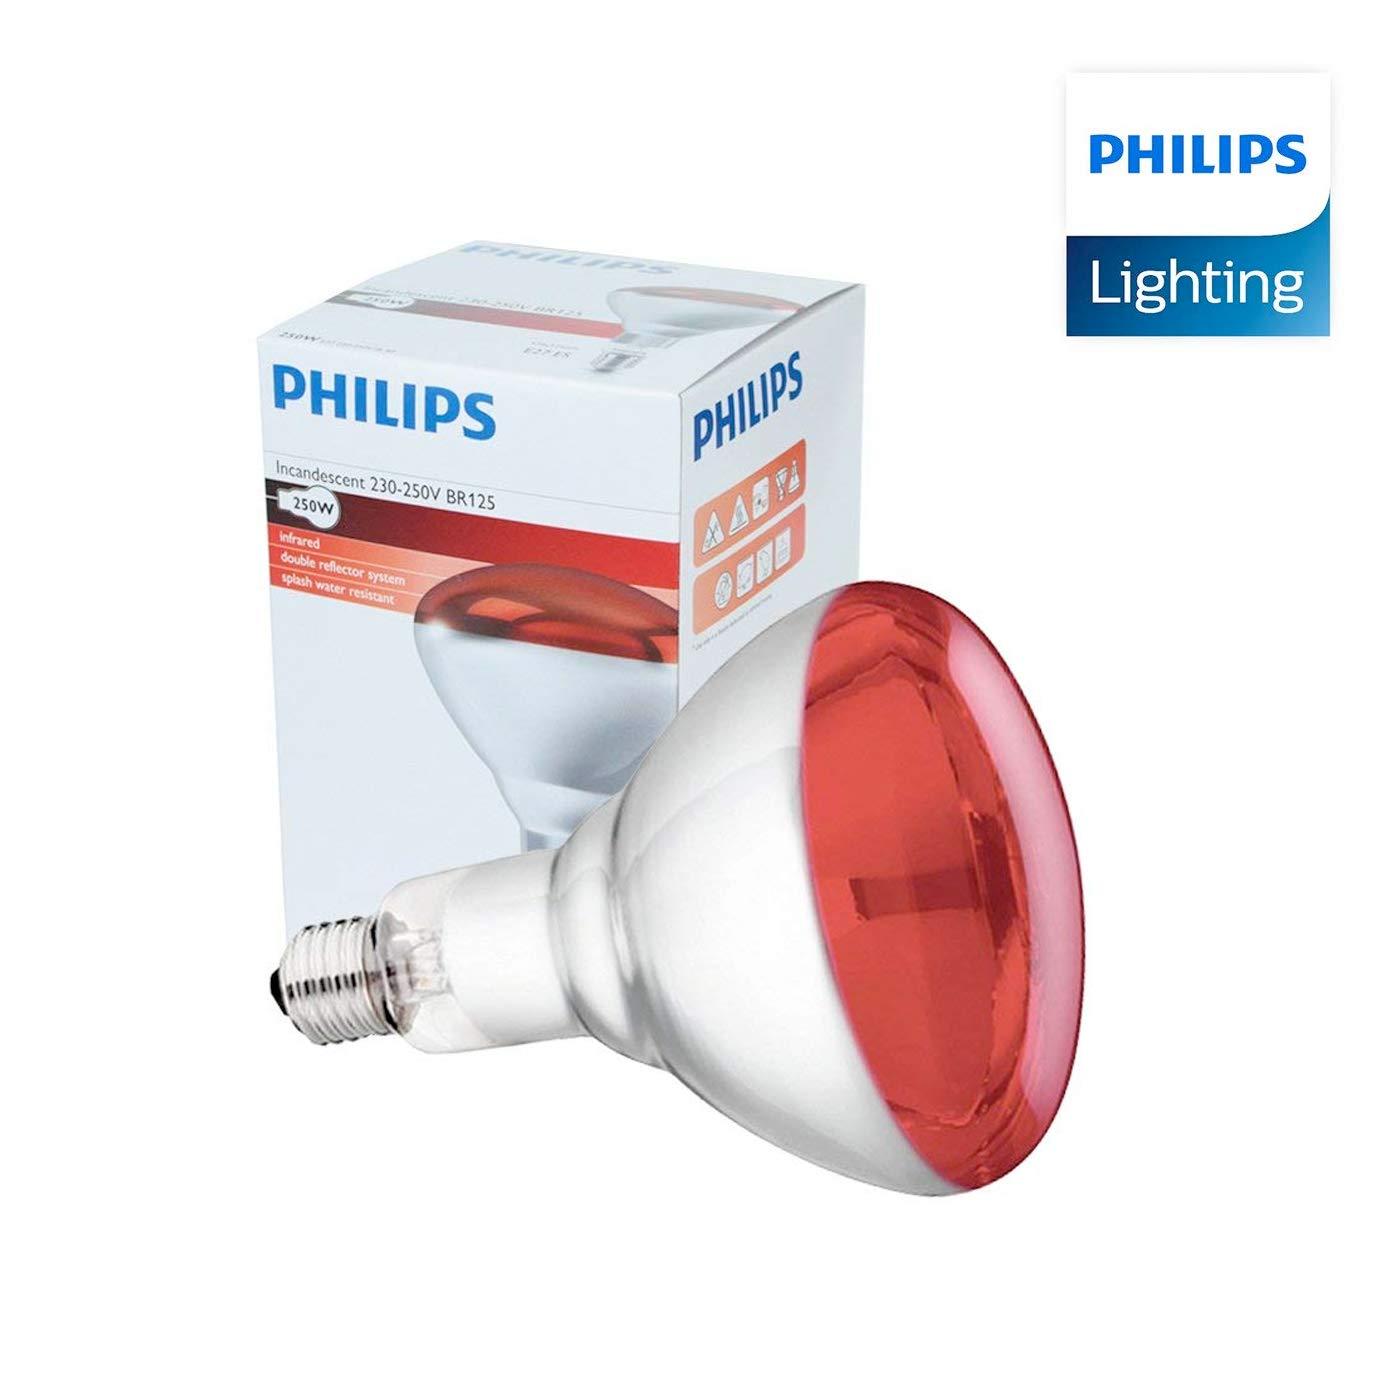 Infrarrojos Bombilla - 250W 230-250V (E27) - Emite Calor - Luz Roja - para Estufa de Infrarrojos Philips